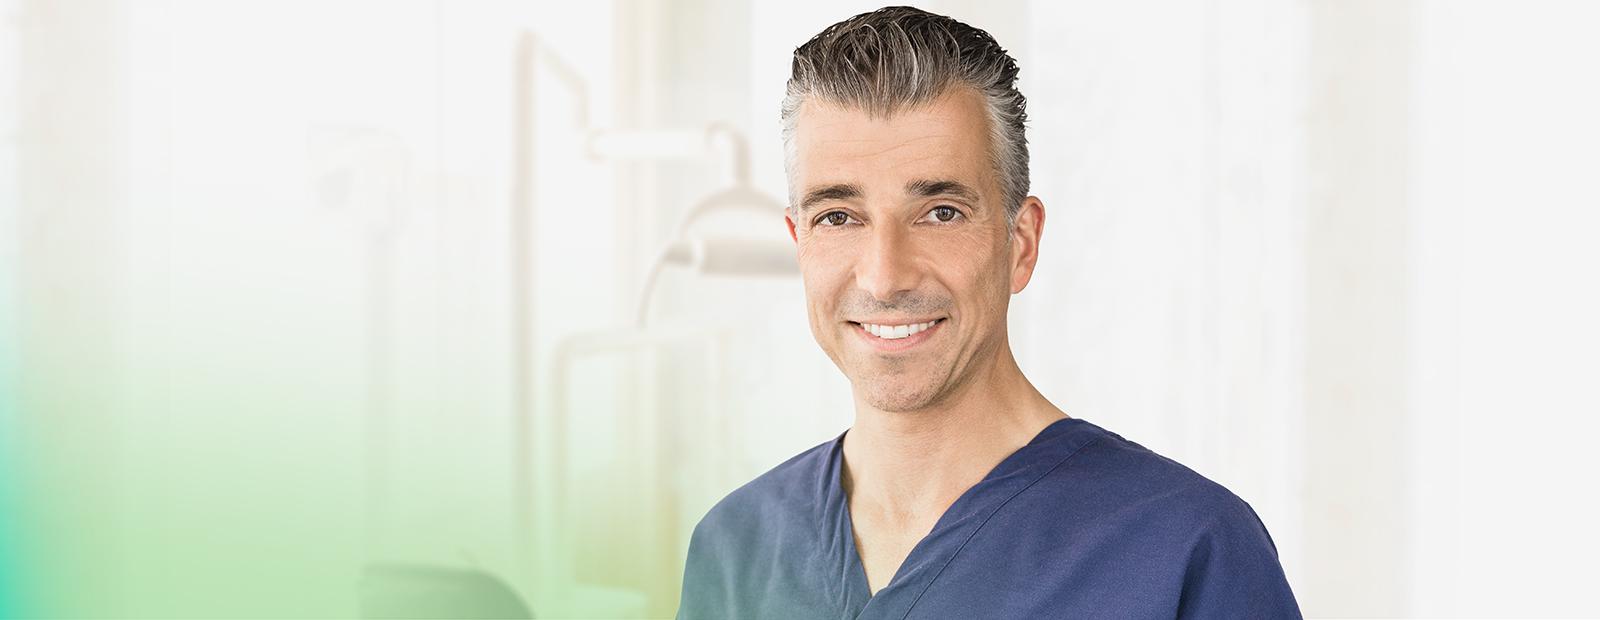 Dr. Philip Abramowski, M. Sc.